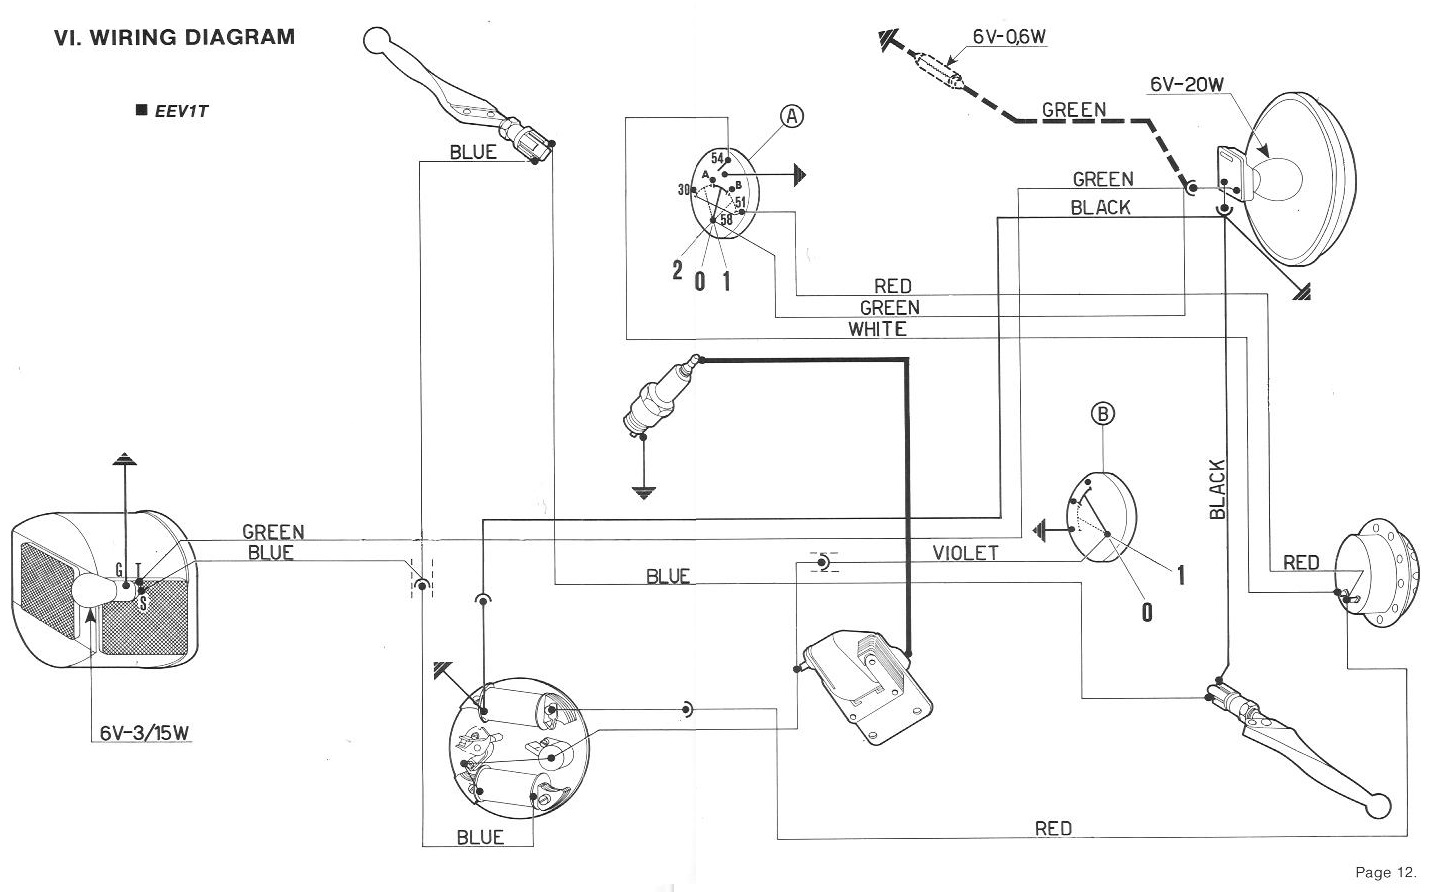 [DIAGRAM] Fiat Bravo 2007 Wiring Diagram FULL Version HD